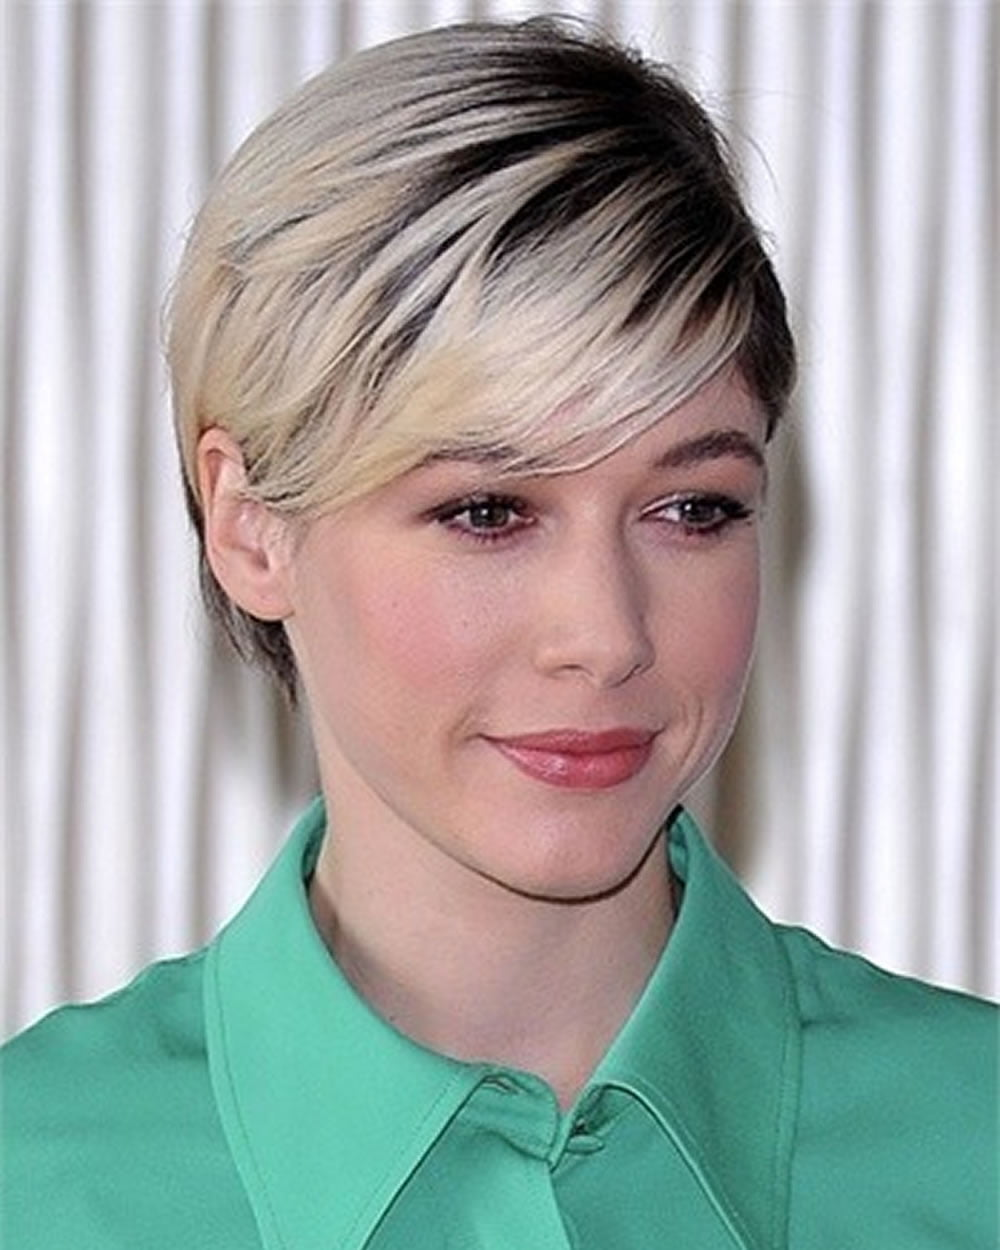 Blonde Balayage Short Hair 2019 Hair Colors